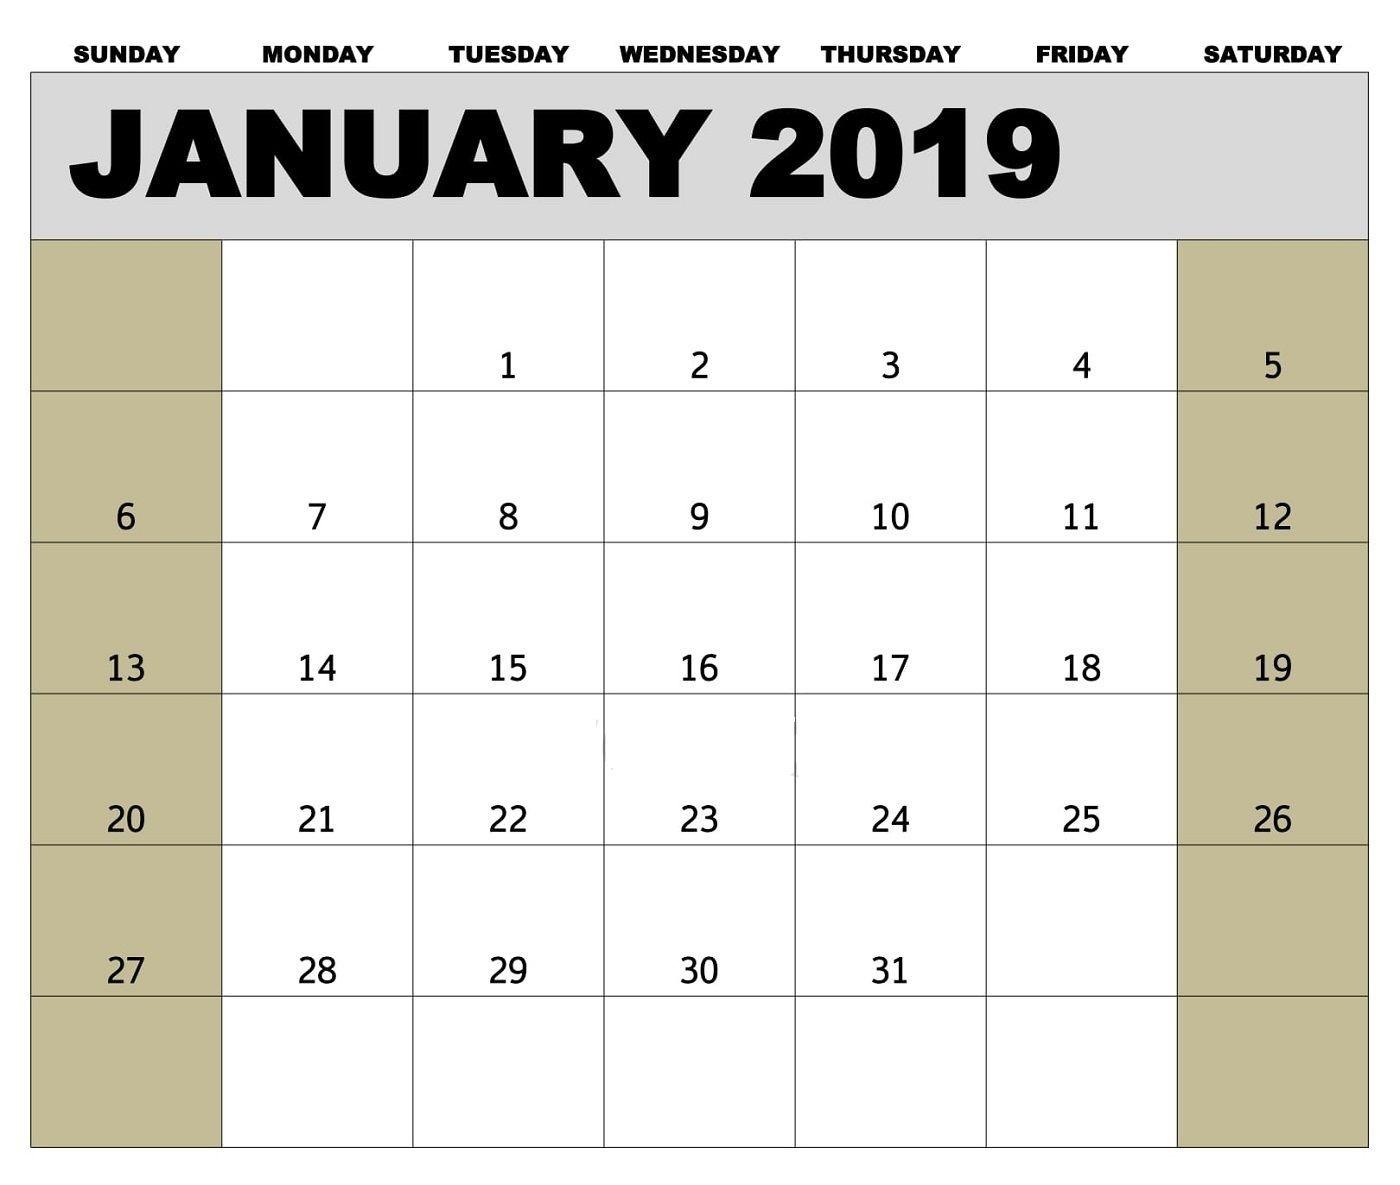 January 2019 Biweekly Payroll Calendar Template For-2020 Biweekly Pay Calendar Word Template